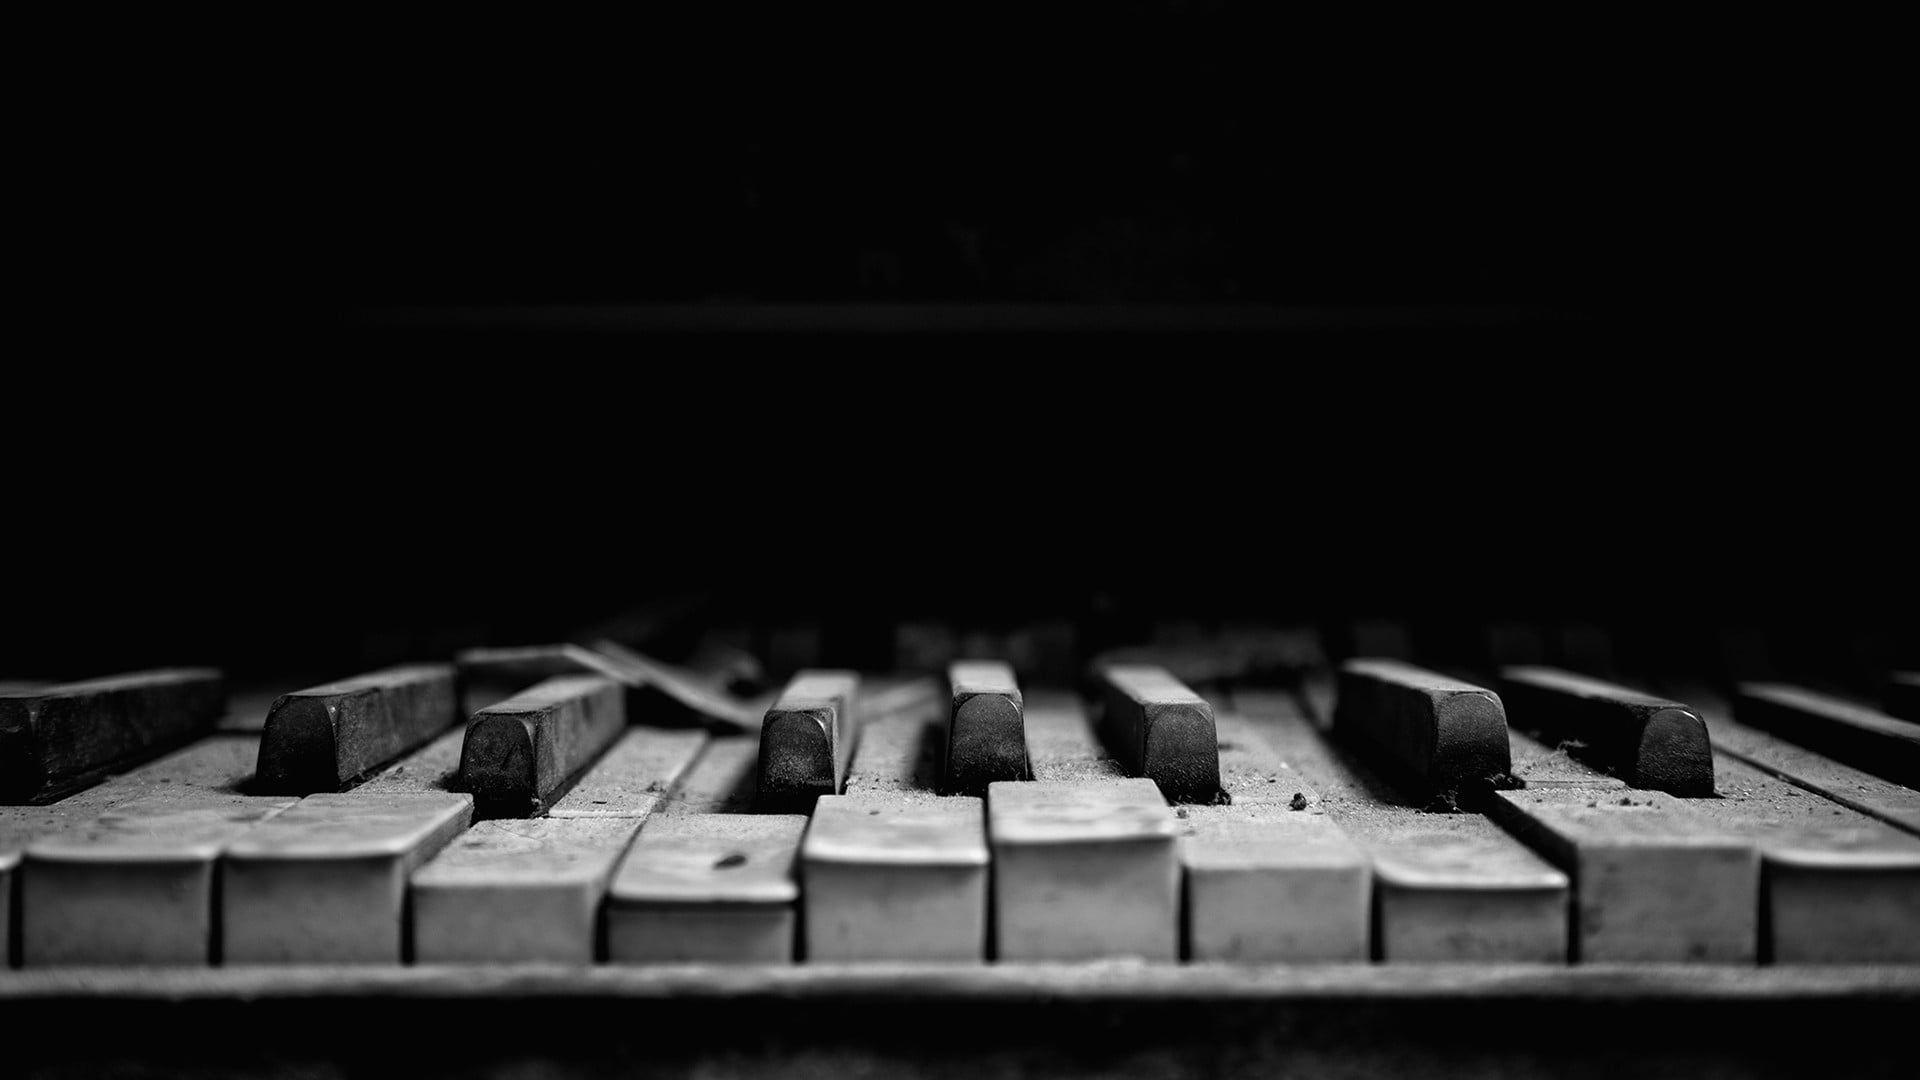 Piano Keys Grayscale Photography Of Piano Piano Musical Instrument Monochrome Dust Music Macro Dark 1080p Wallpaper Piano Keys Piano Music Wallpaper Hd wallpaper piano keys macro musical